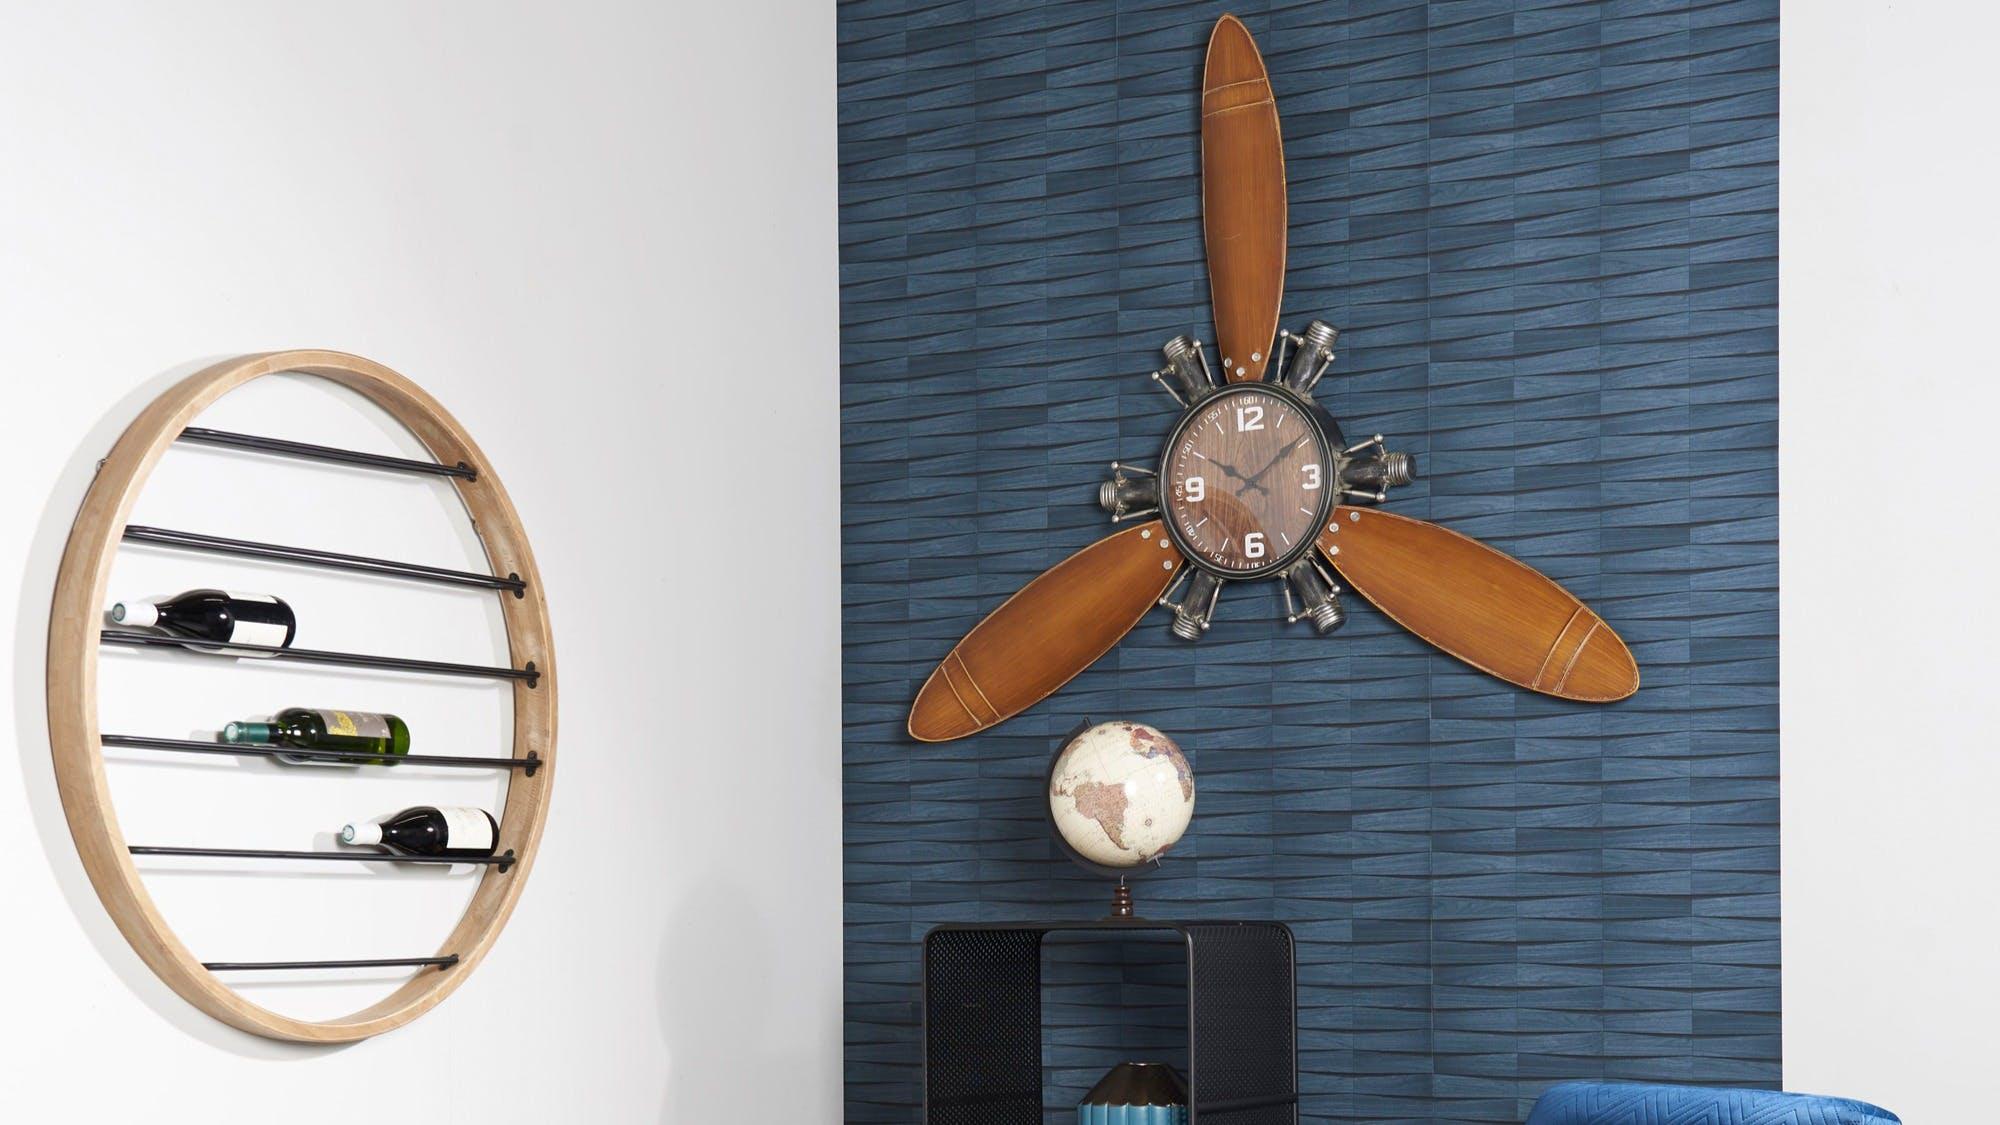 Horloges : vintage, industrielle...